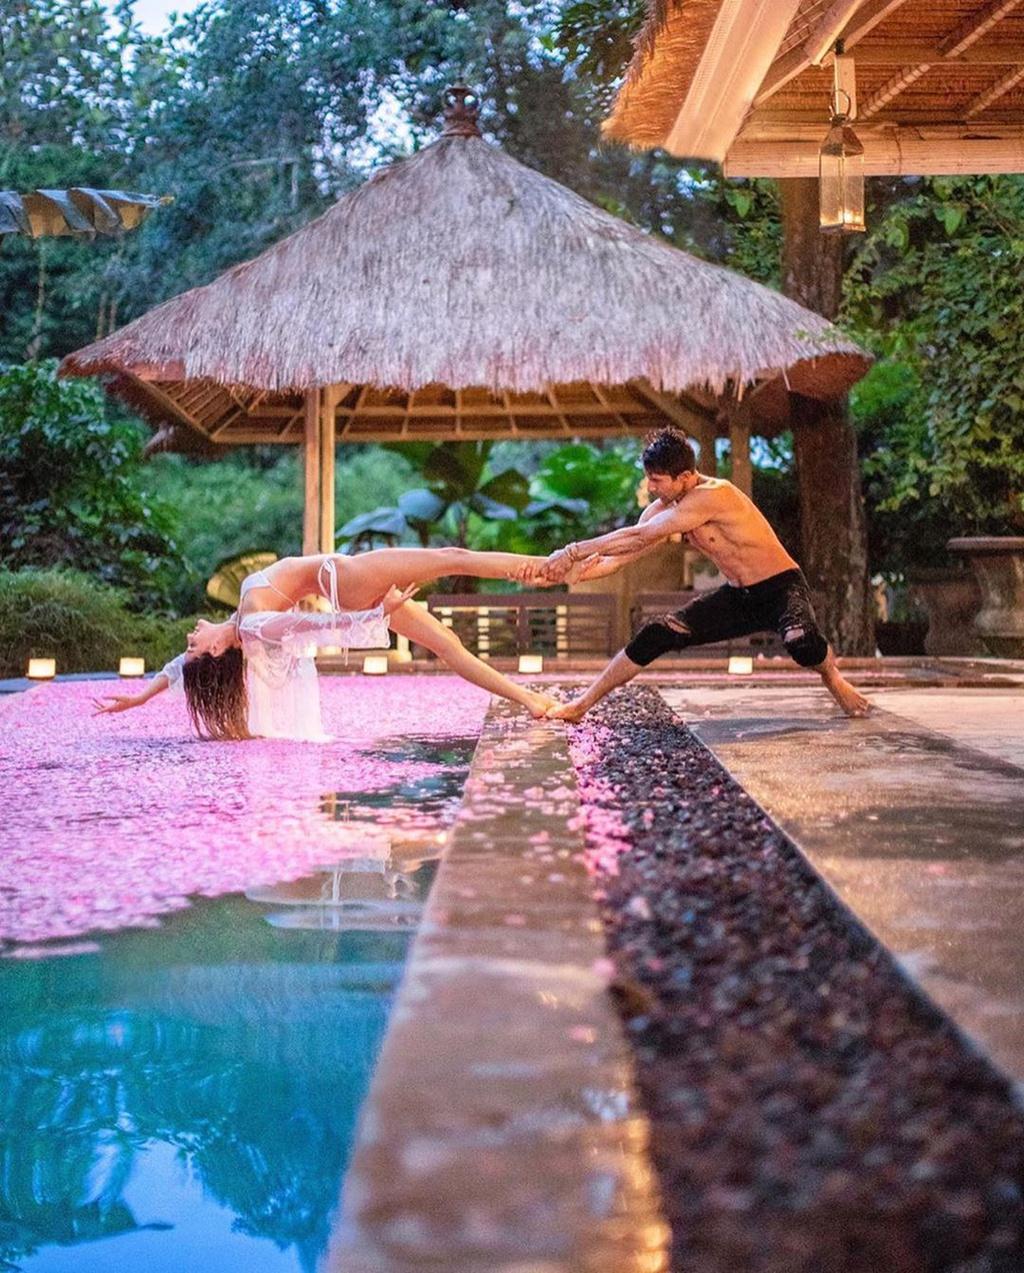 Bali, Paris ngot lim trong anh mua yeu cua cac blogger noi tieng hinh anh 5 3.2_creativetravelcouples.jpg